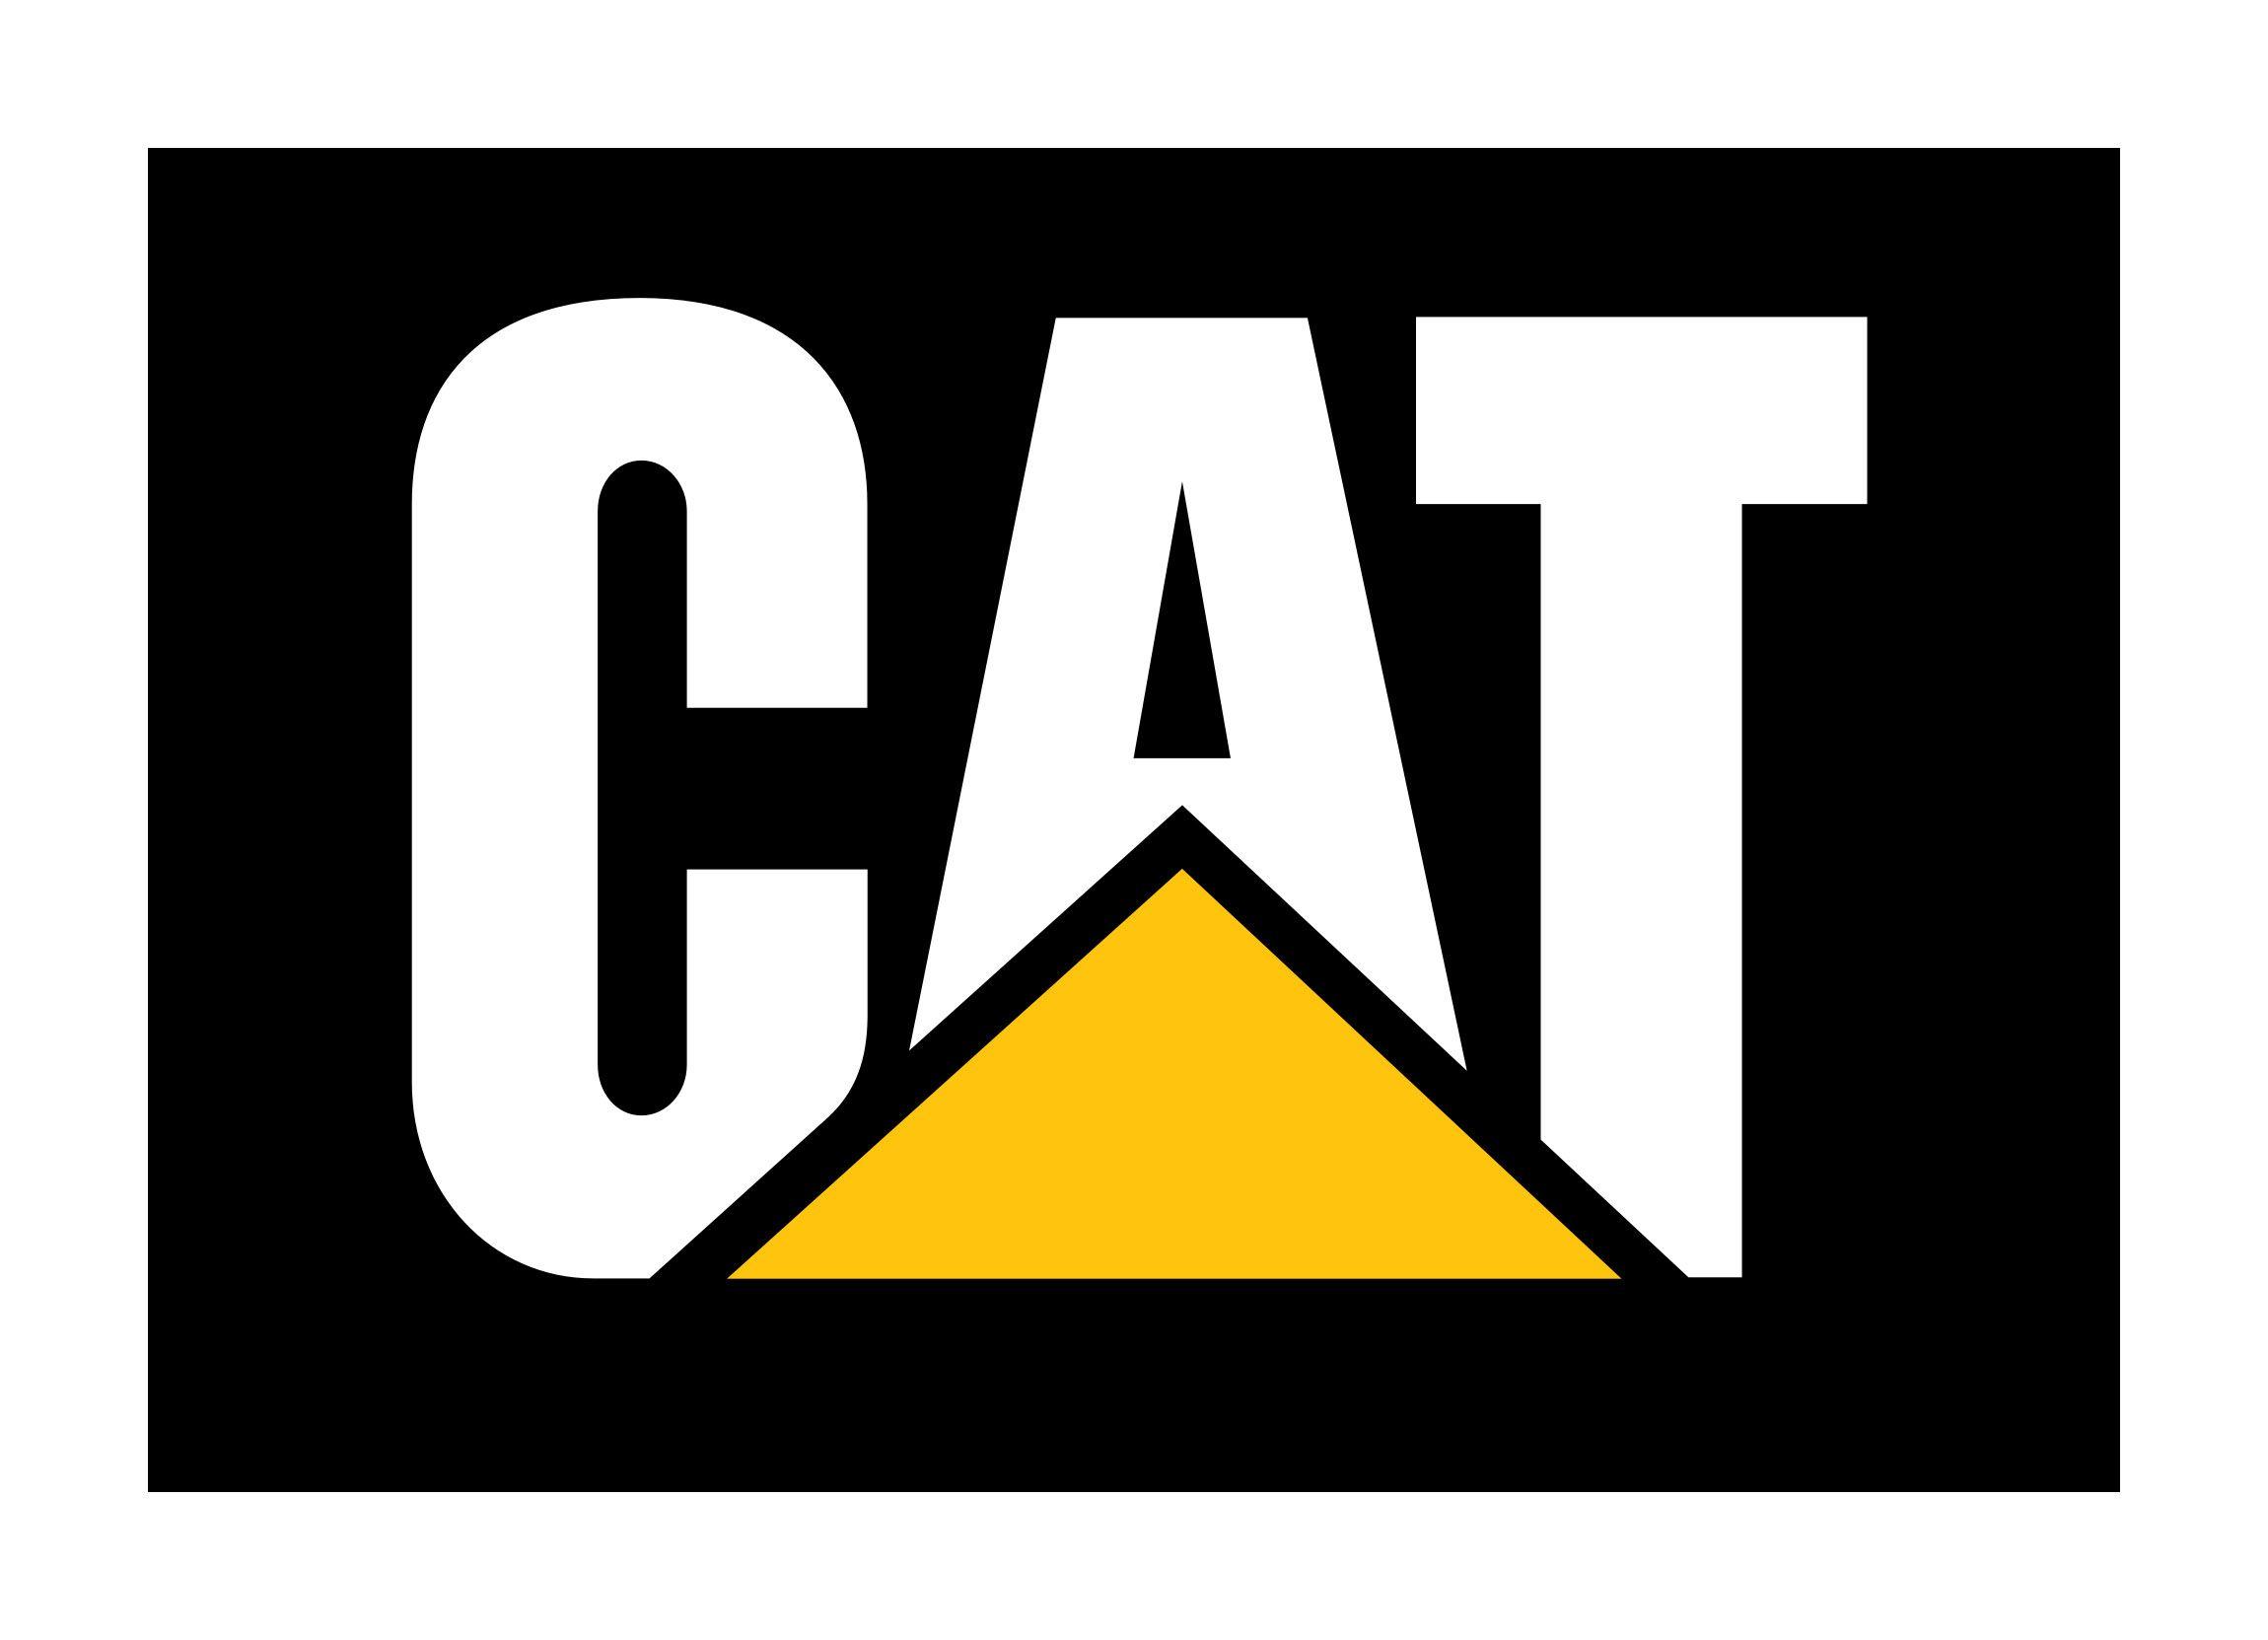 Symbol logos caterpillar logo caterprillar symbol meaning history and